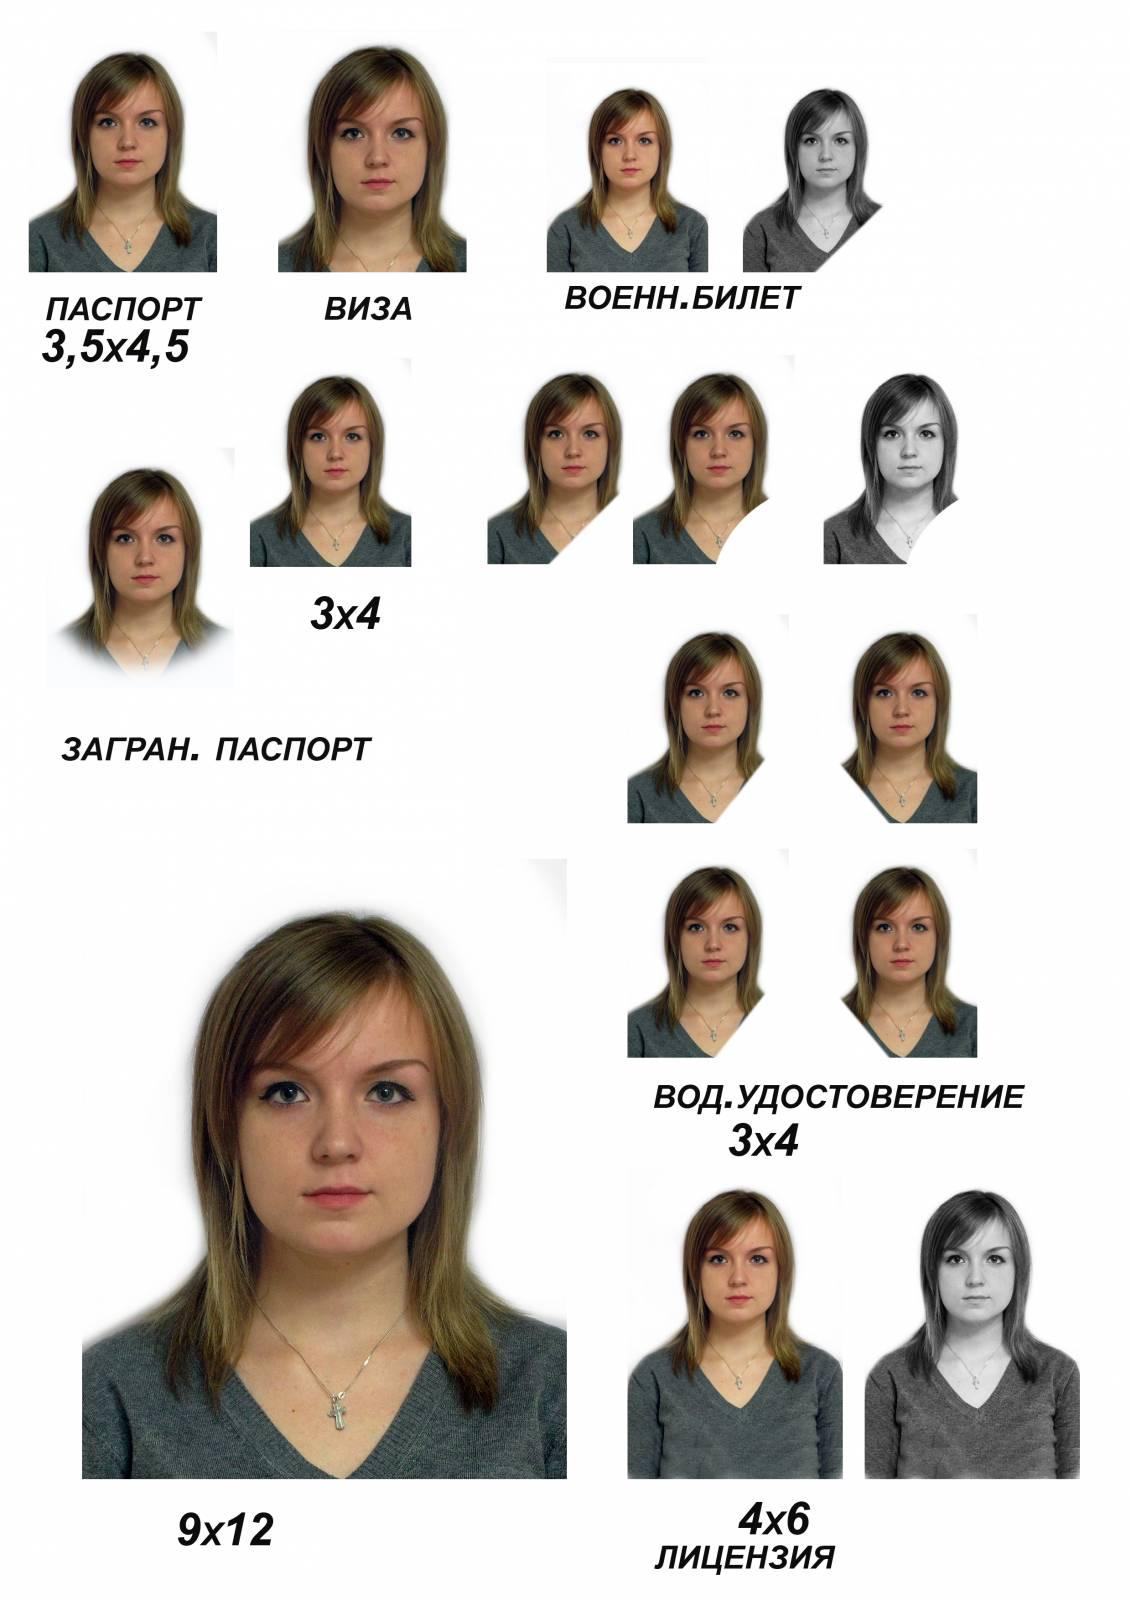 Фото на документы: http://www.multiservices.ru/foto/foto-dok/